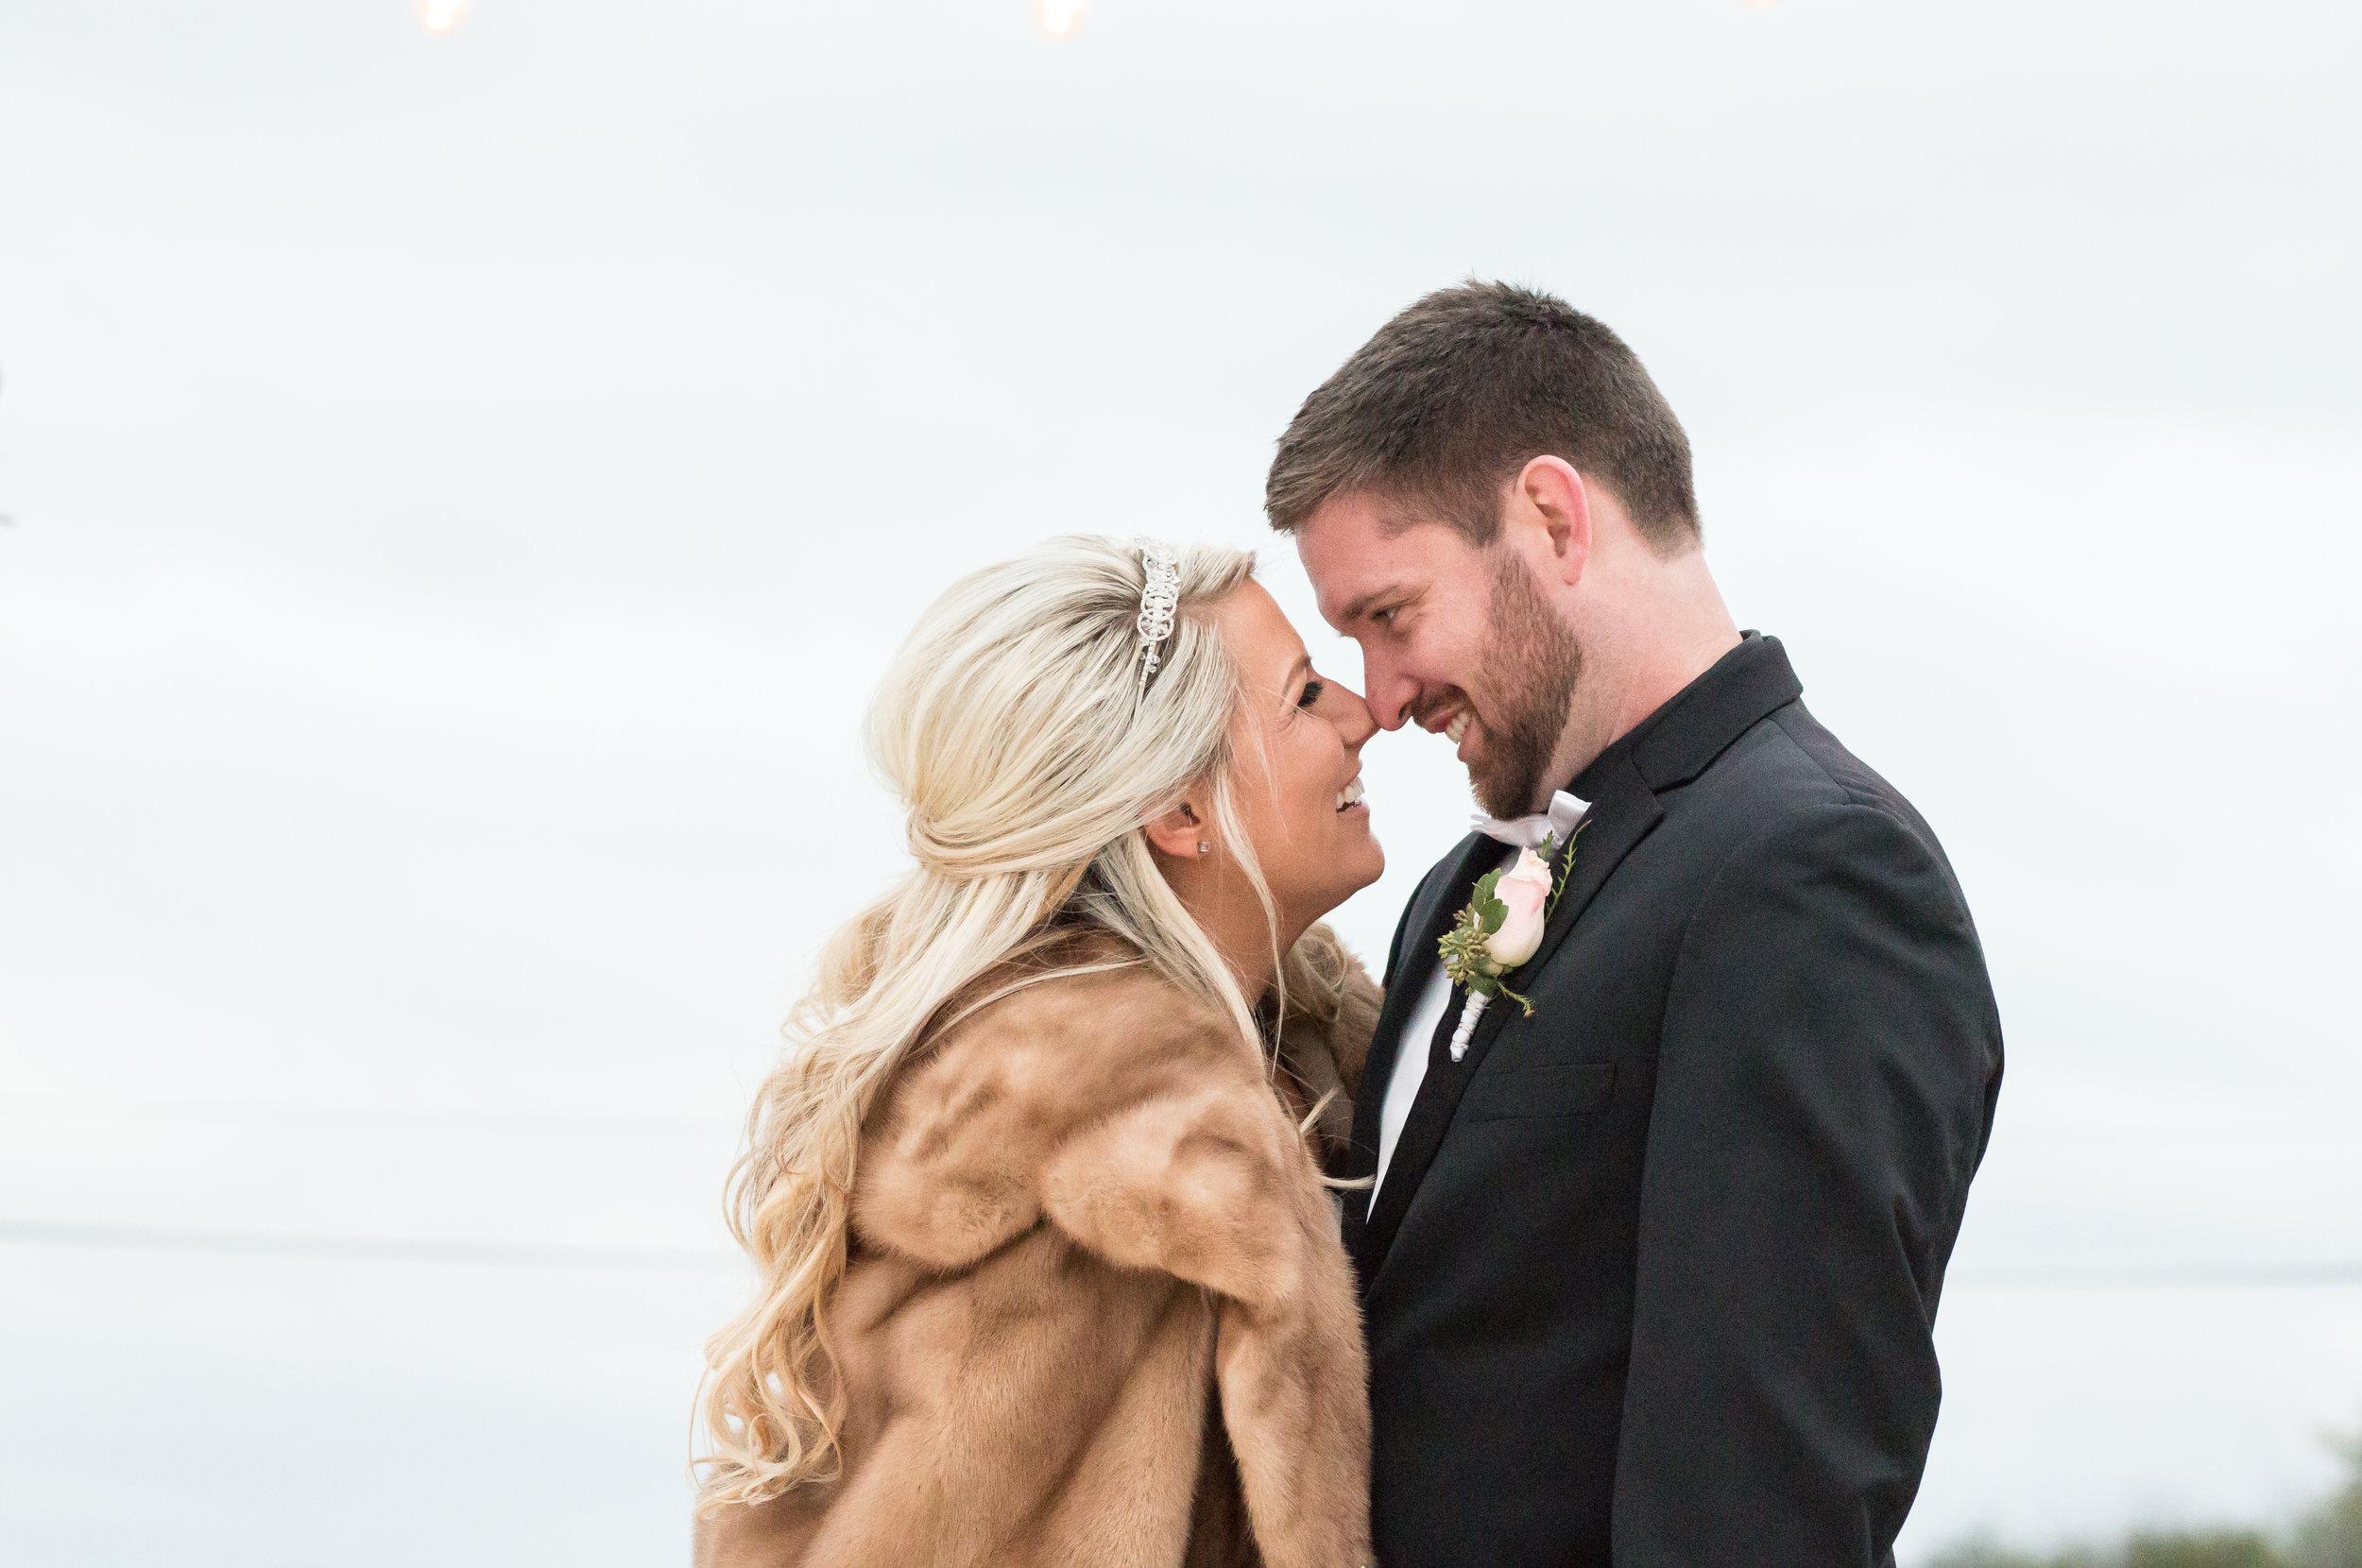 Jessica & Kurtis Wedding_26 - 20171028.jpg